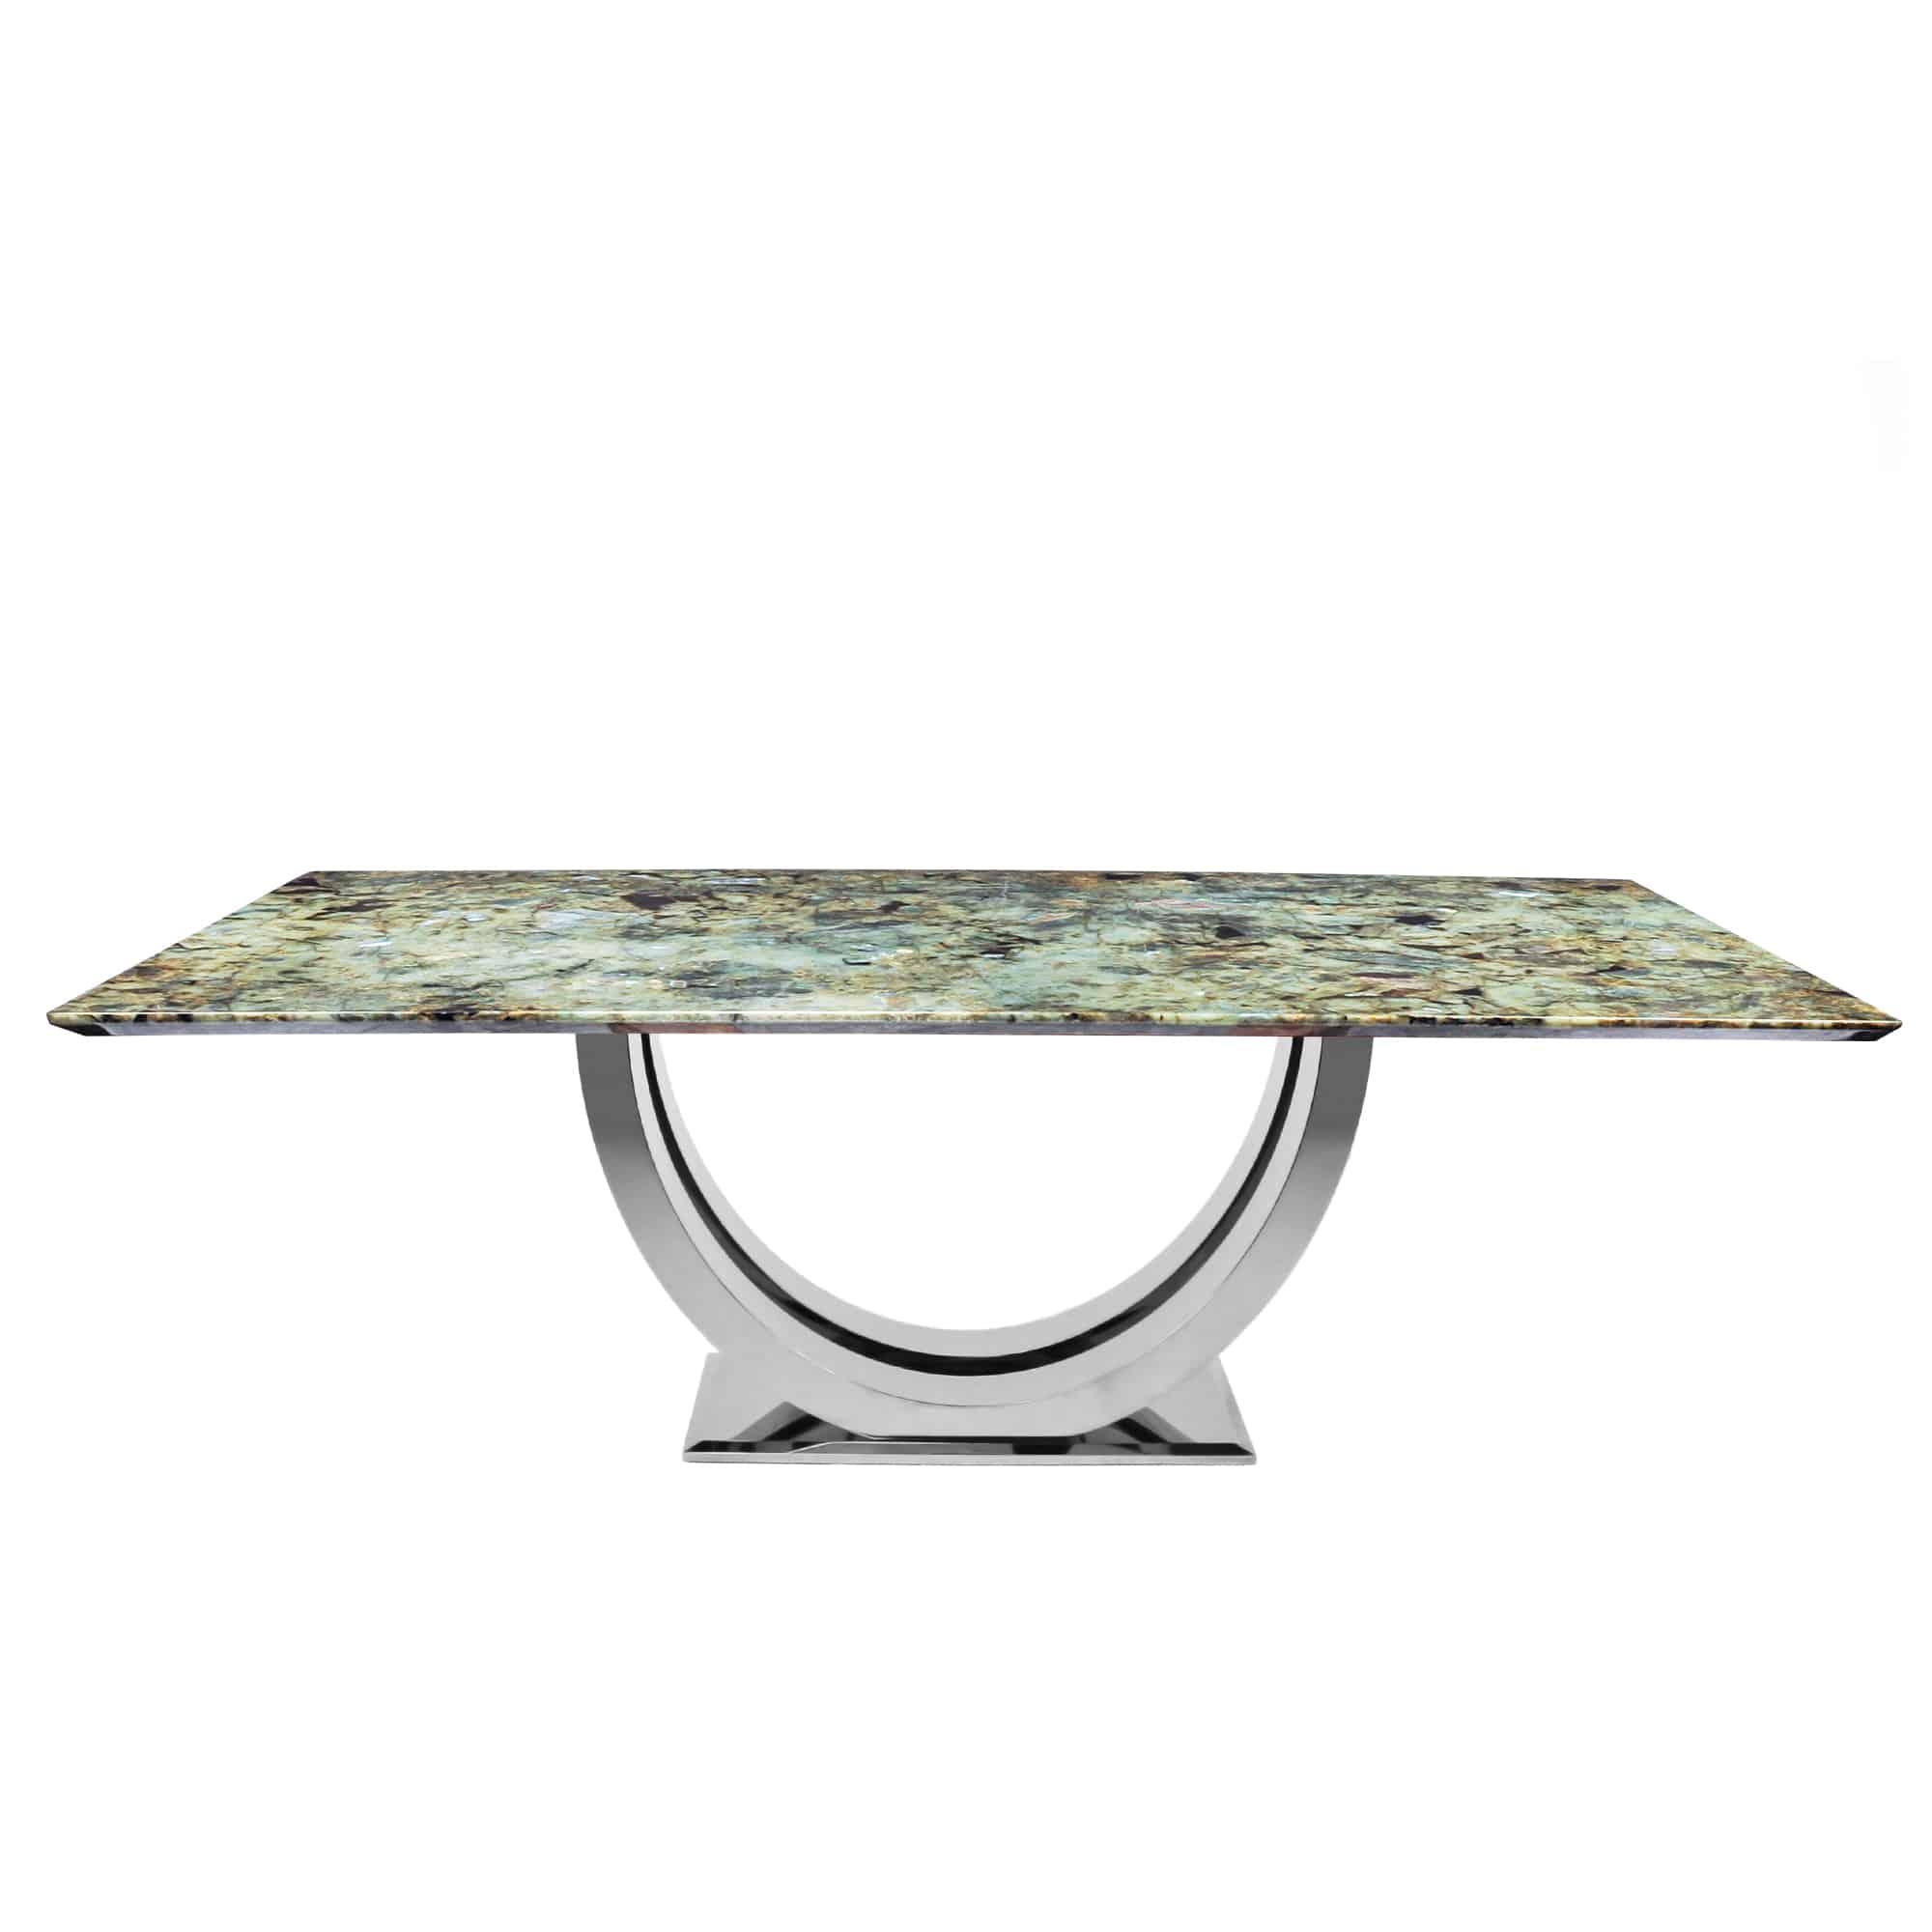 Miraculous Decasa Rectangular Granite Dining Table Blue Jade Gamerscity Chair Design For Home Gamerscityorg